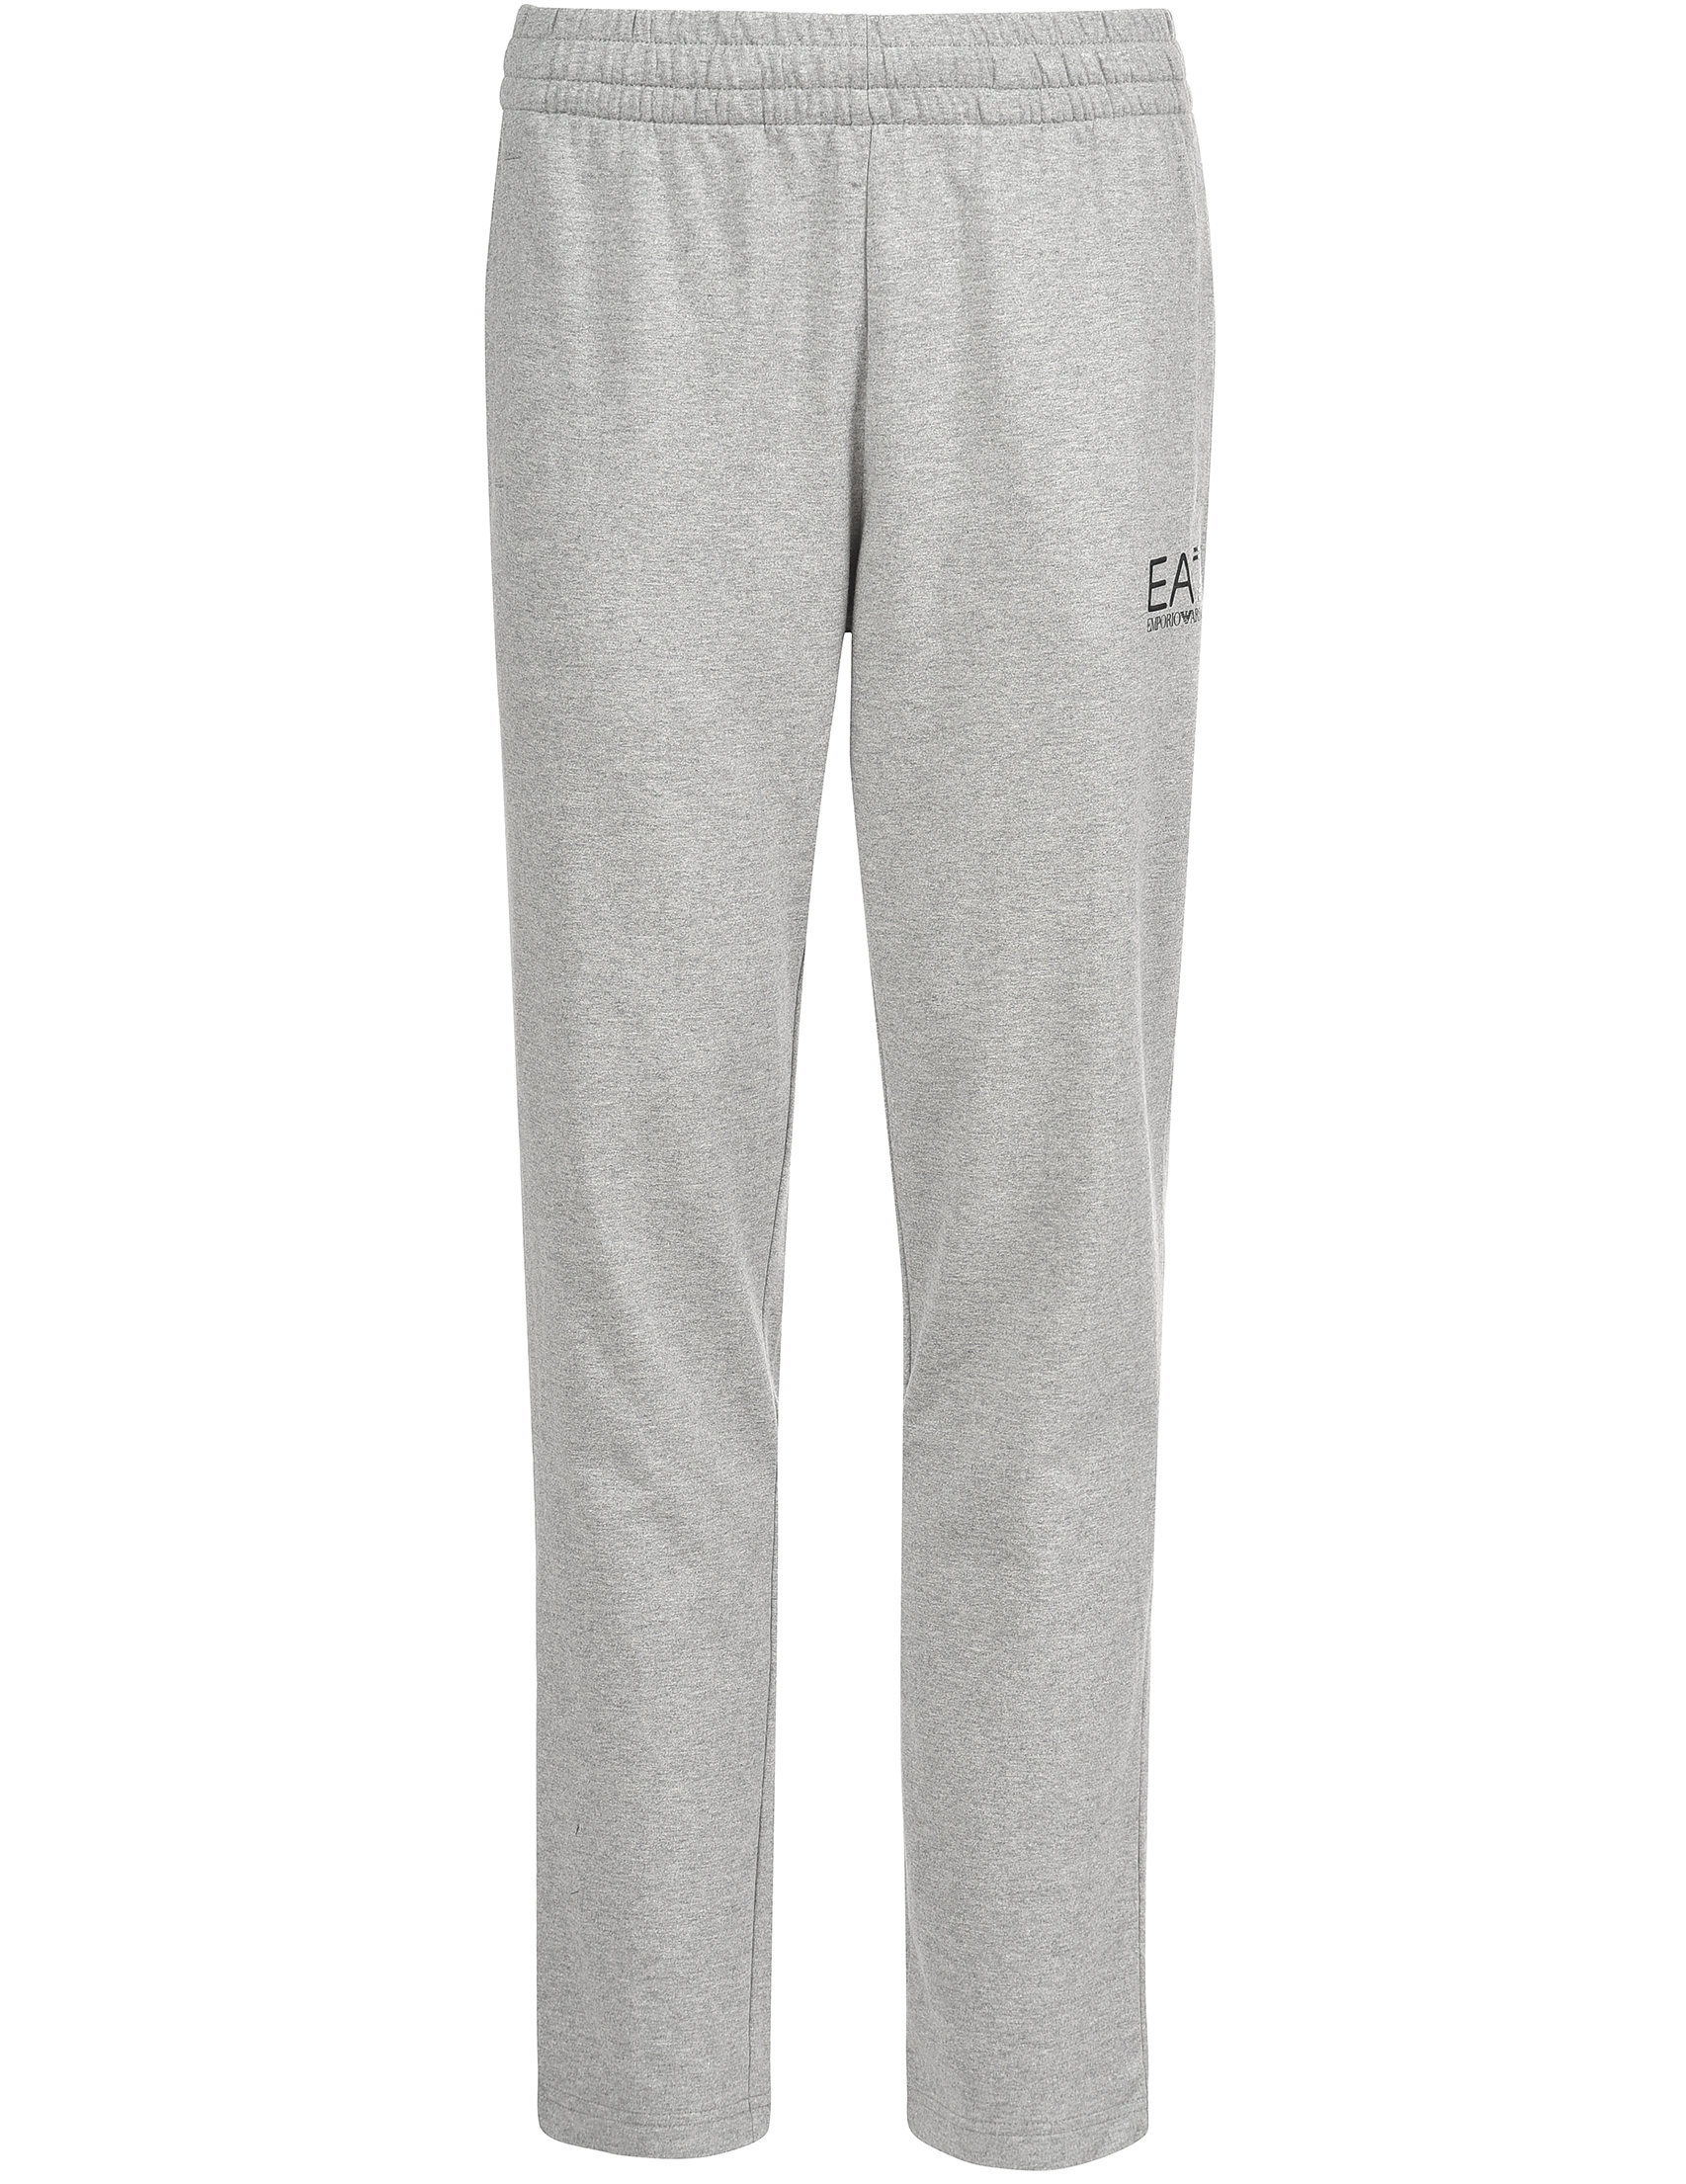 Мужские спортивные брюки EA7 EMPORIO ARMANI 6ZPP51-PJ05Z-3905_gray